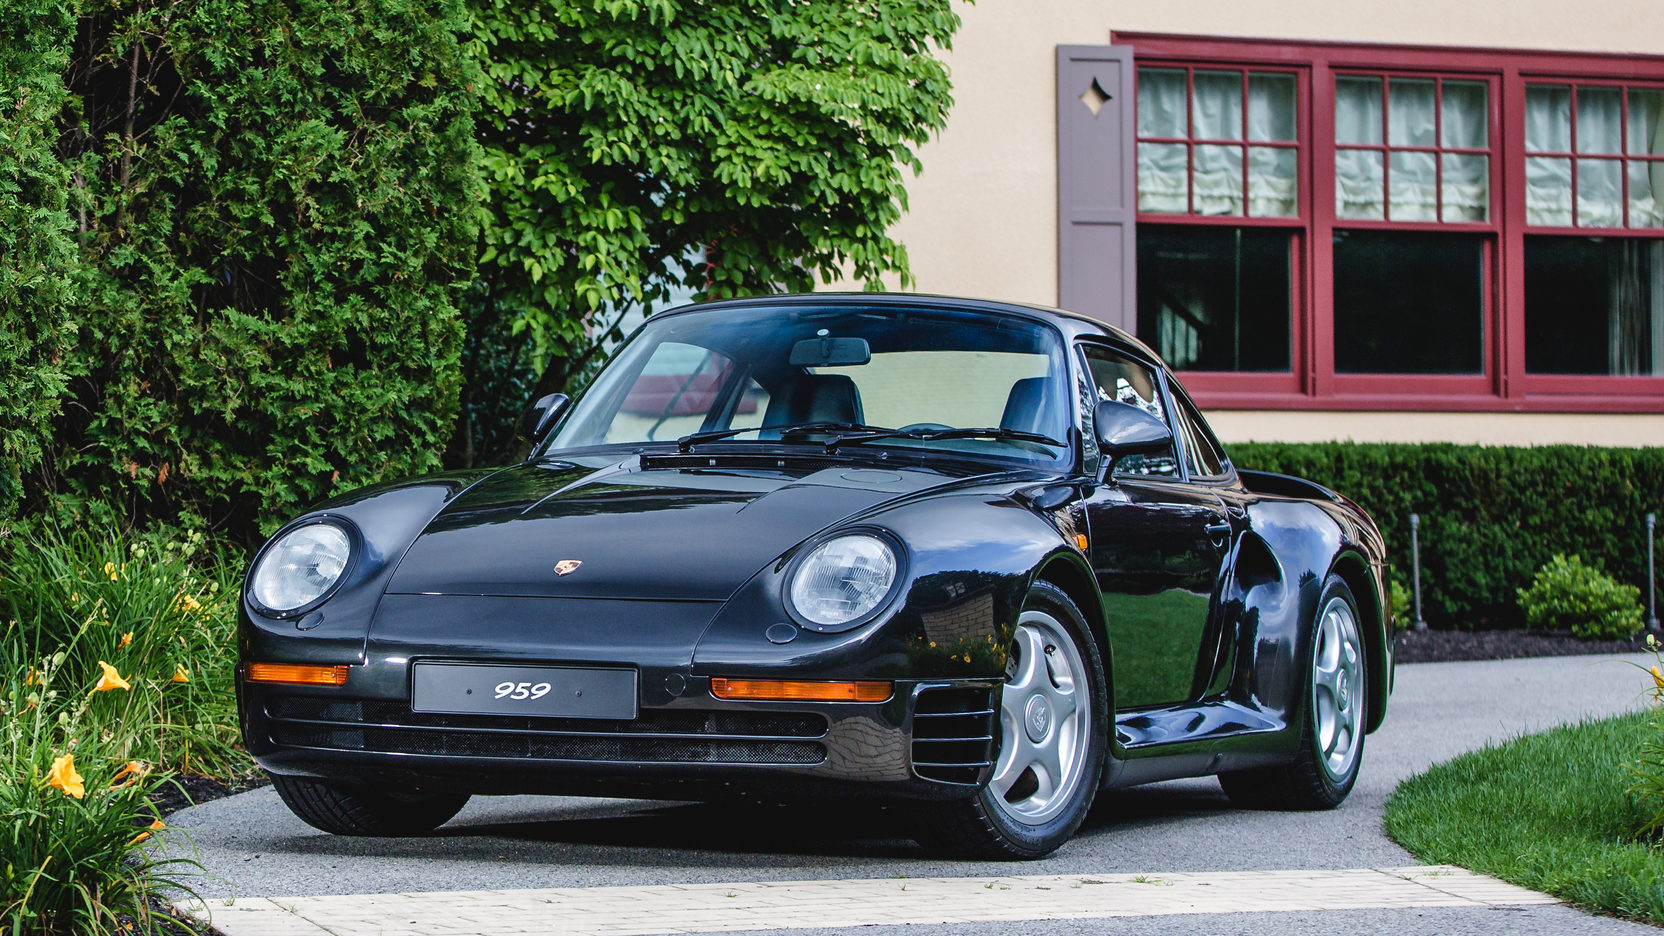 Black Porsche 959 sitting in driveway outside house